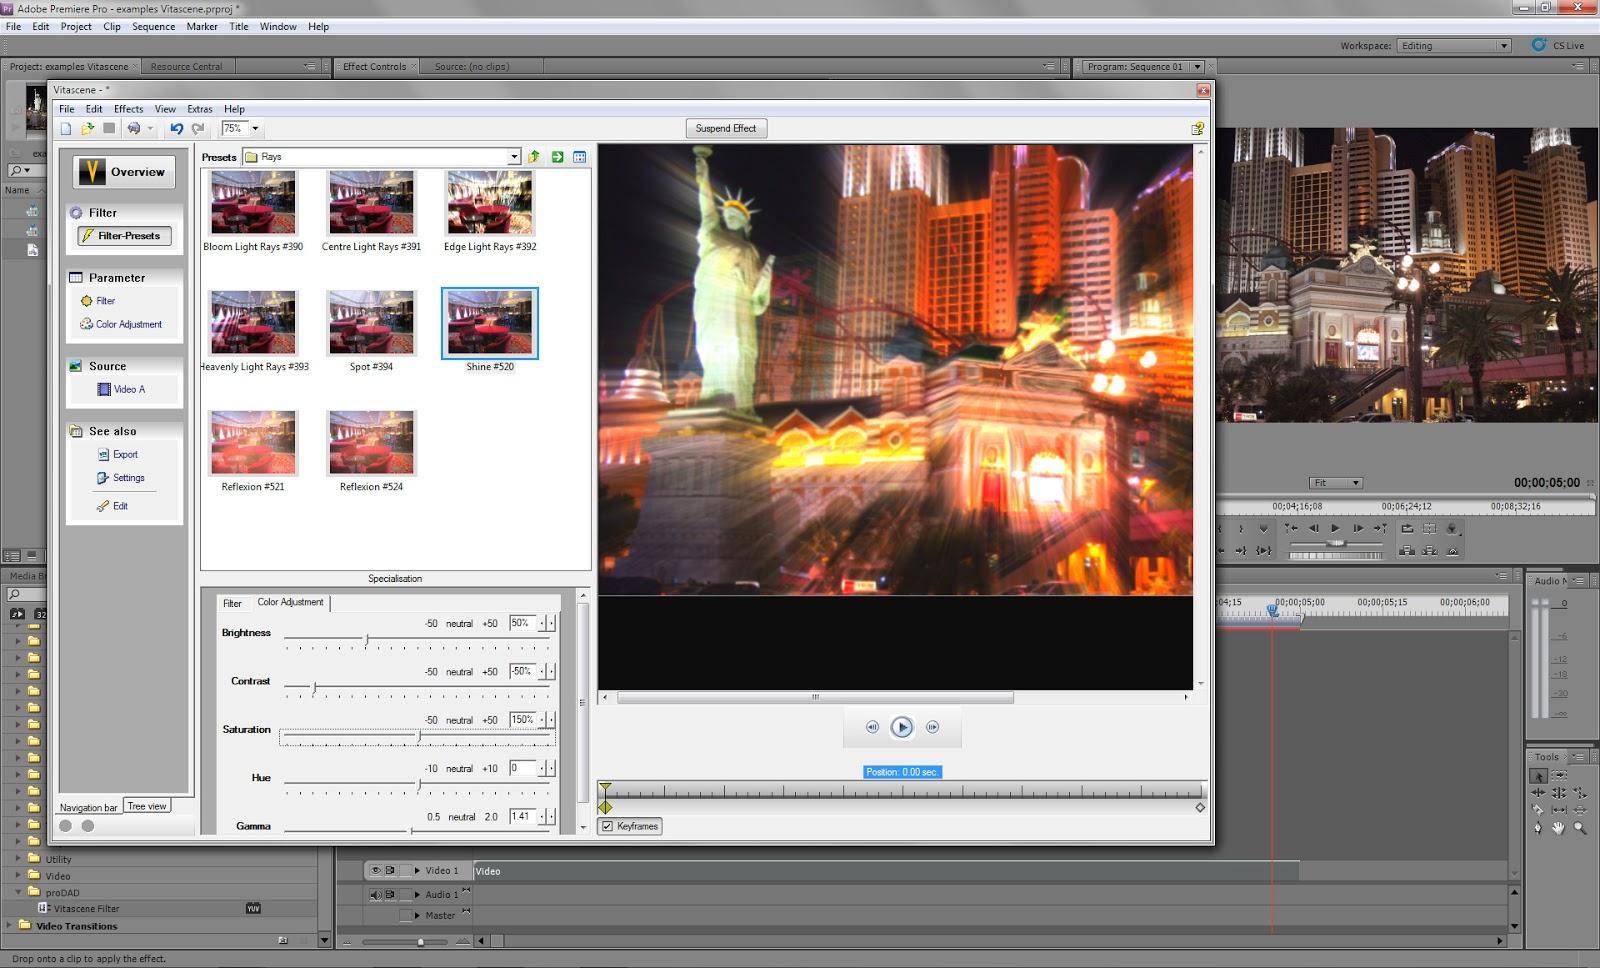 700+ proDAD VitaScene Transition Effects Plugin For Premiere